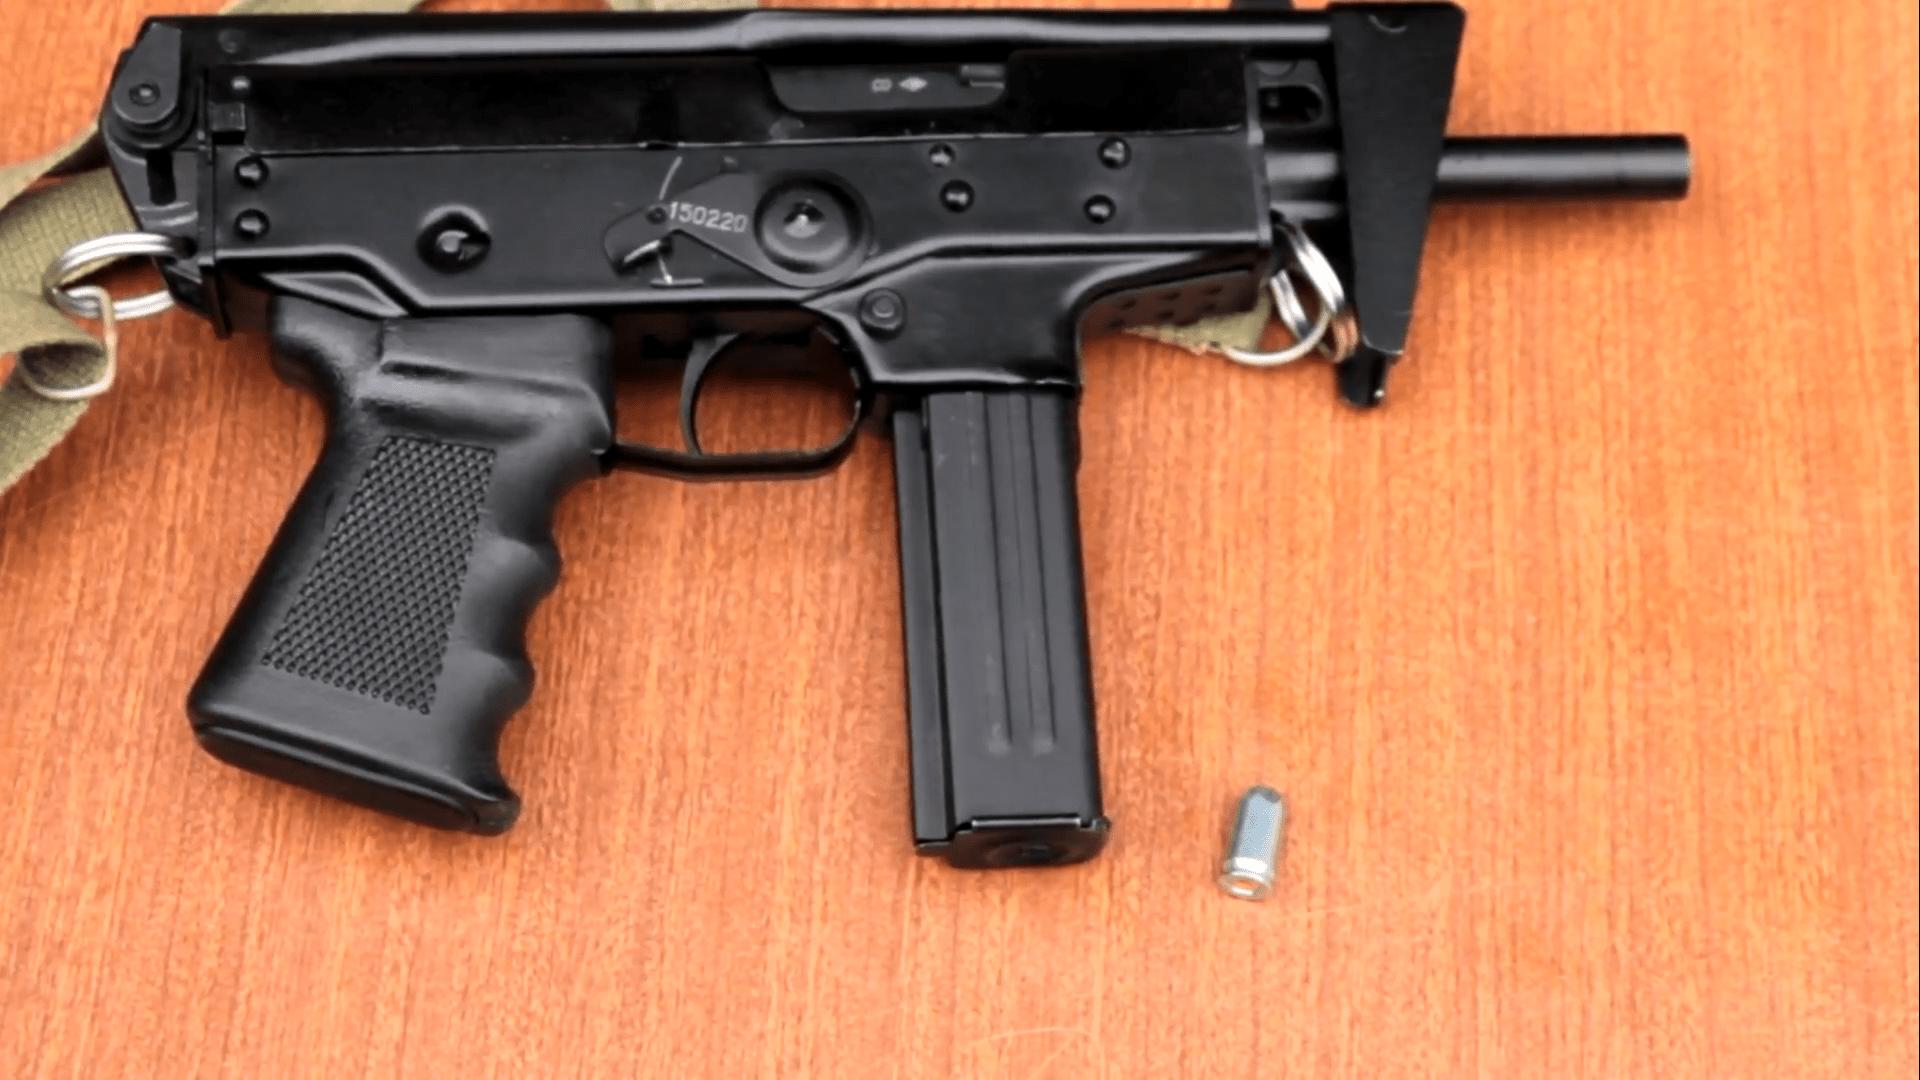 Пистолет-пулемет ПП-91 Кедр: разработка Драгунова